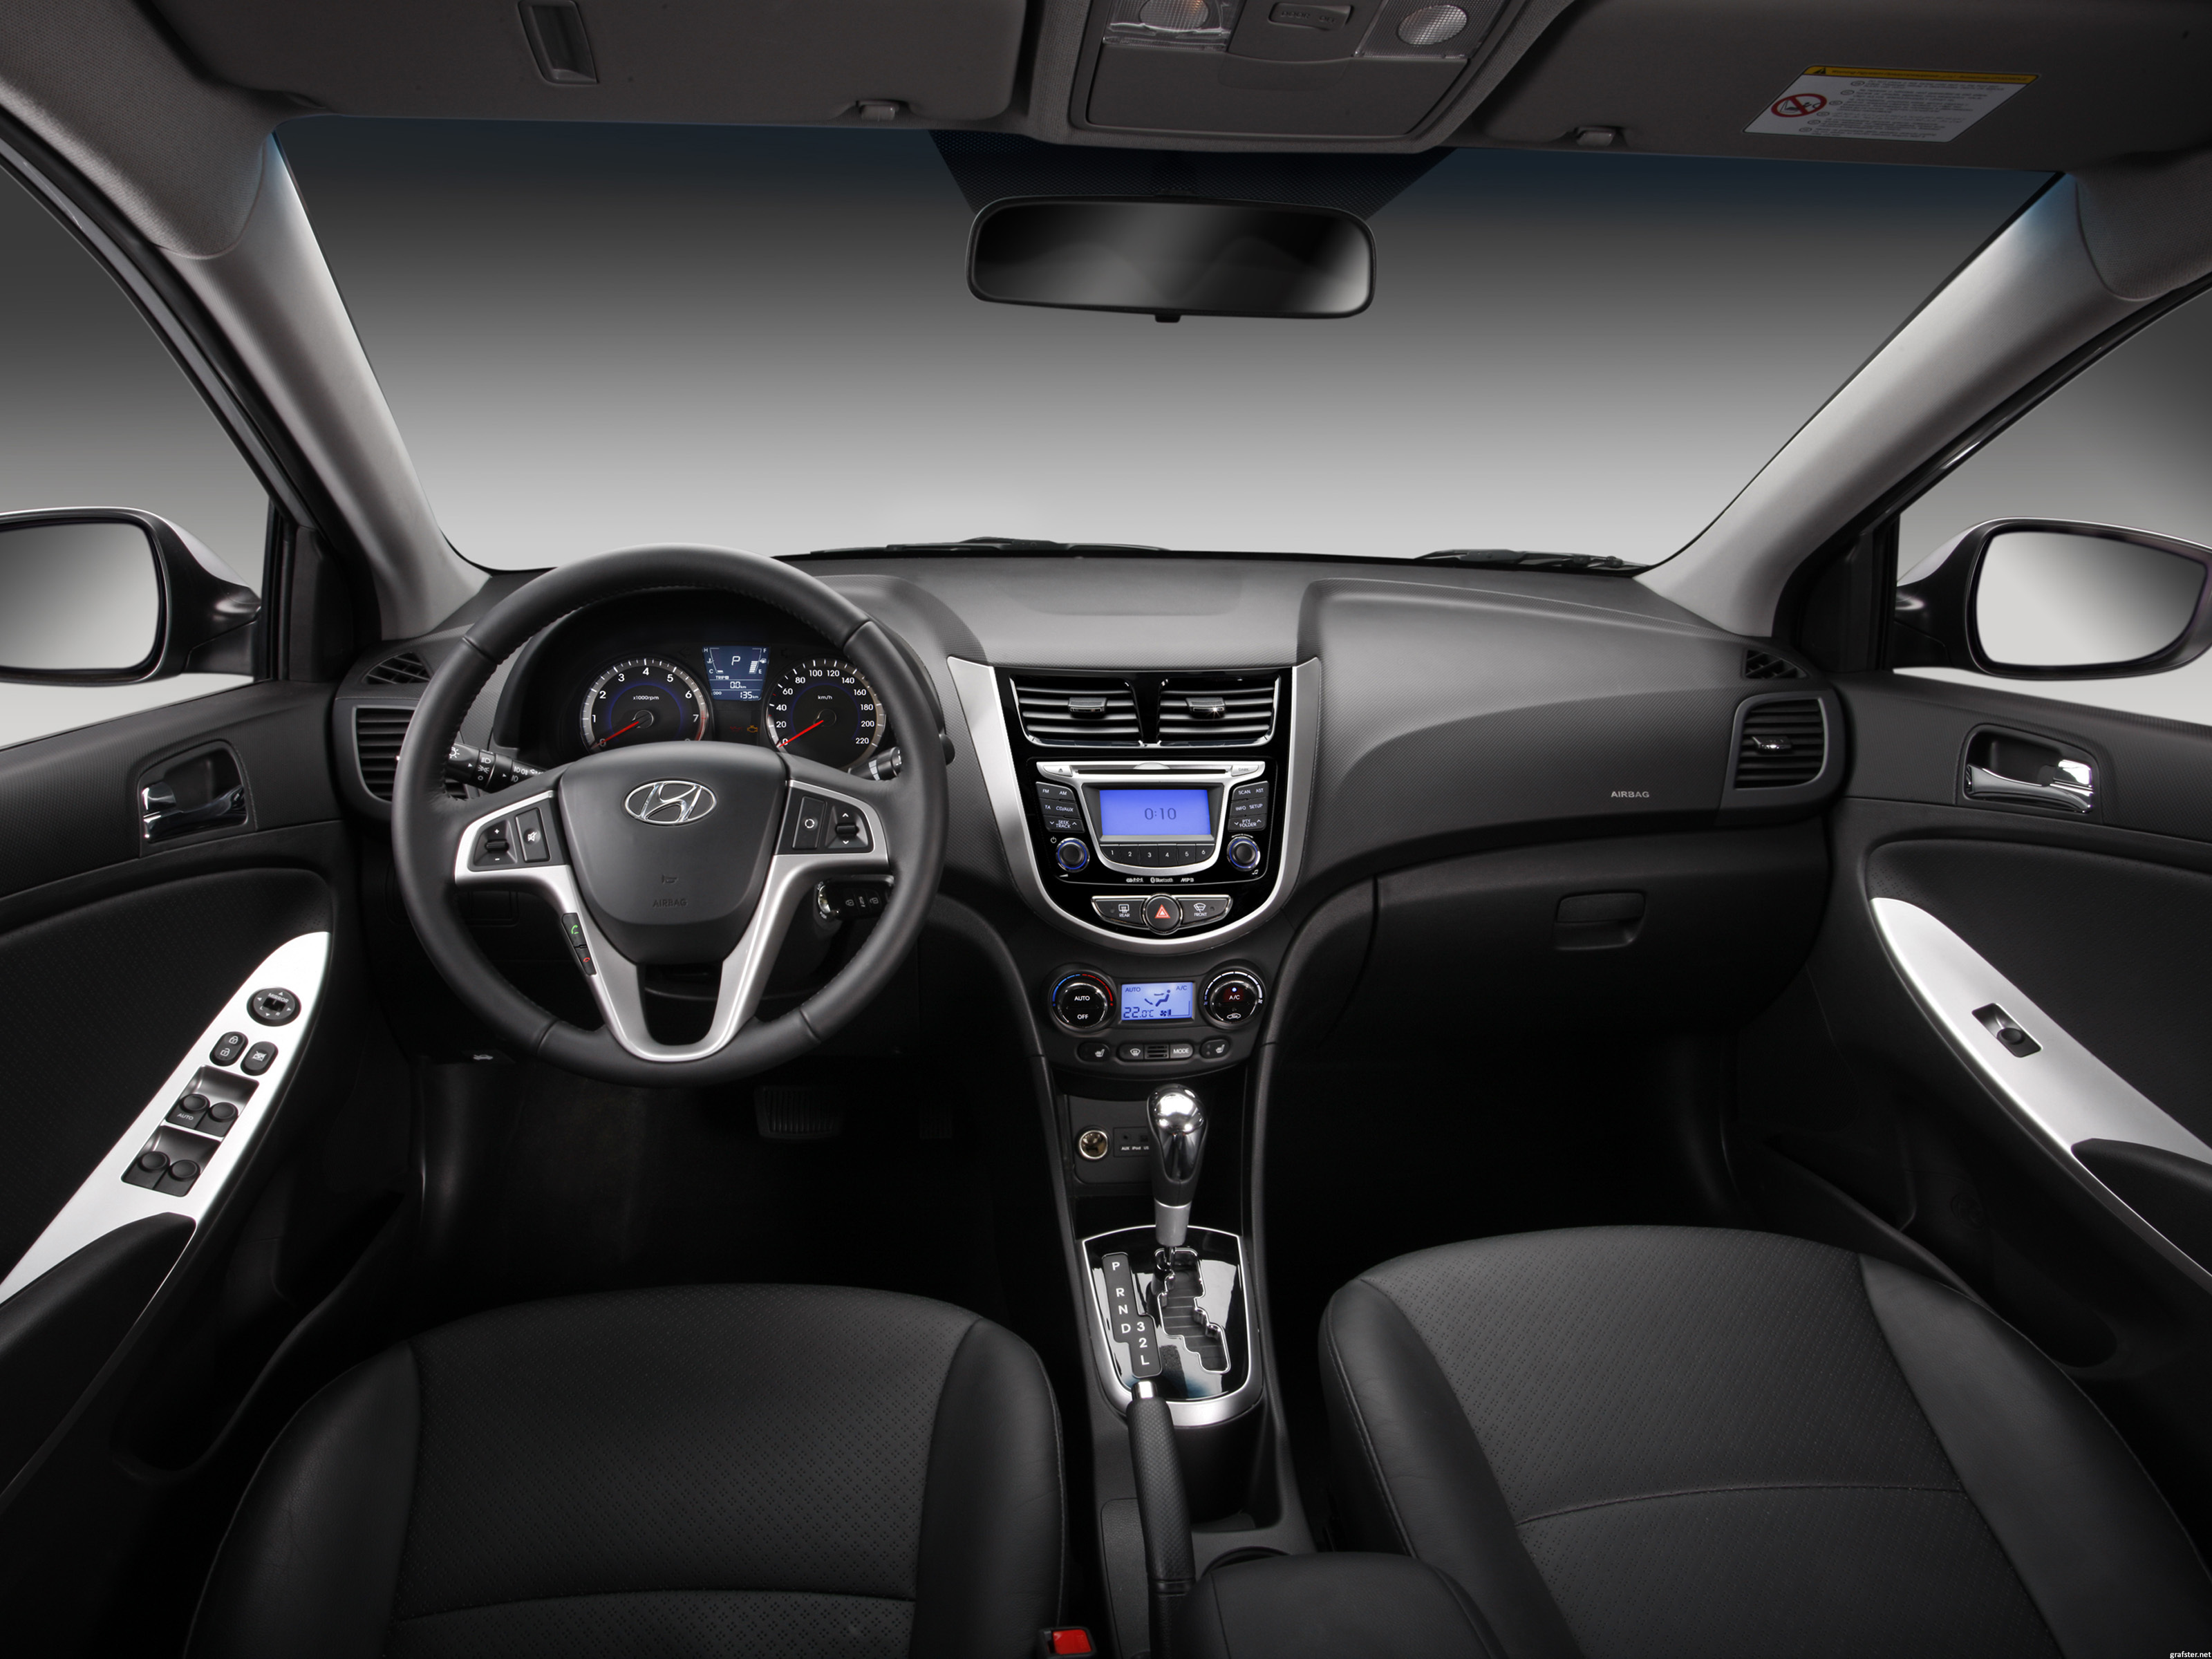 Hyundai Solaris I 2010 - 2014 Sedan #2